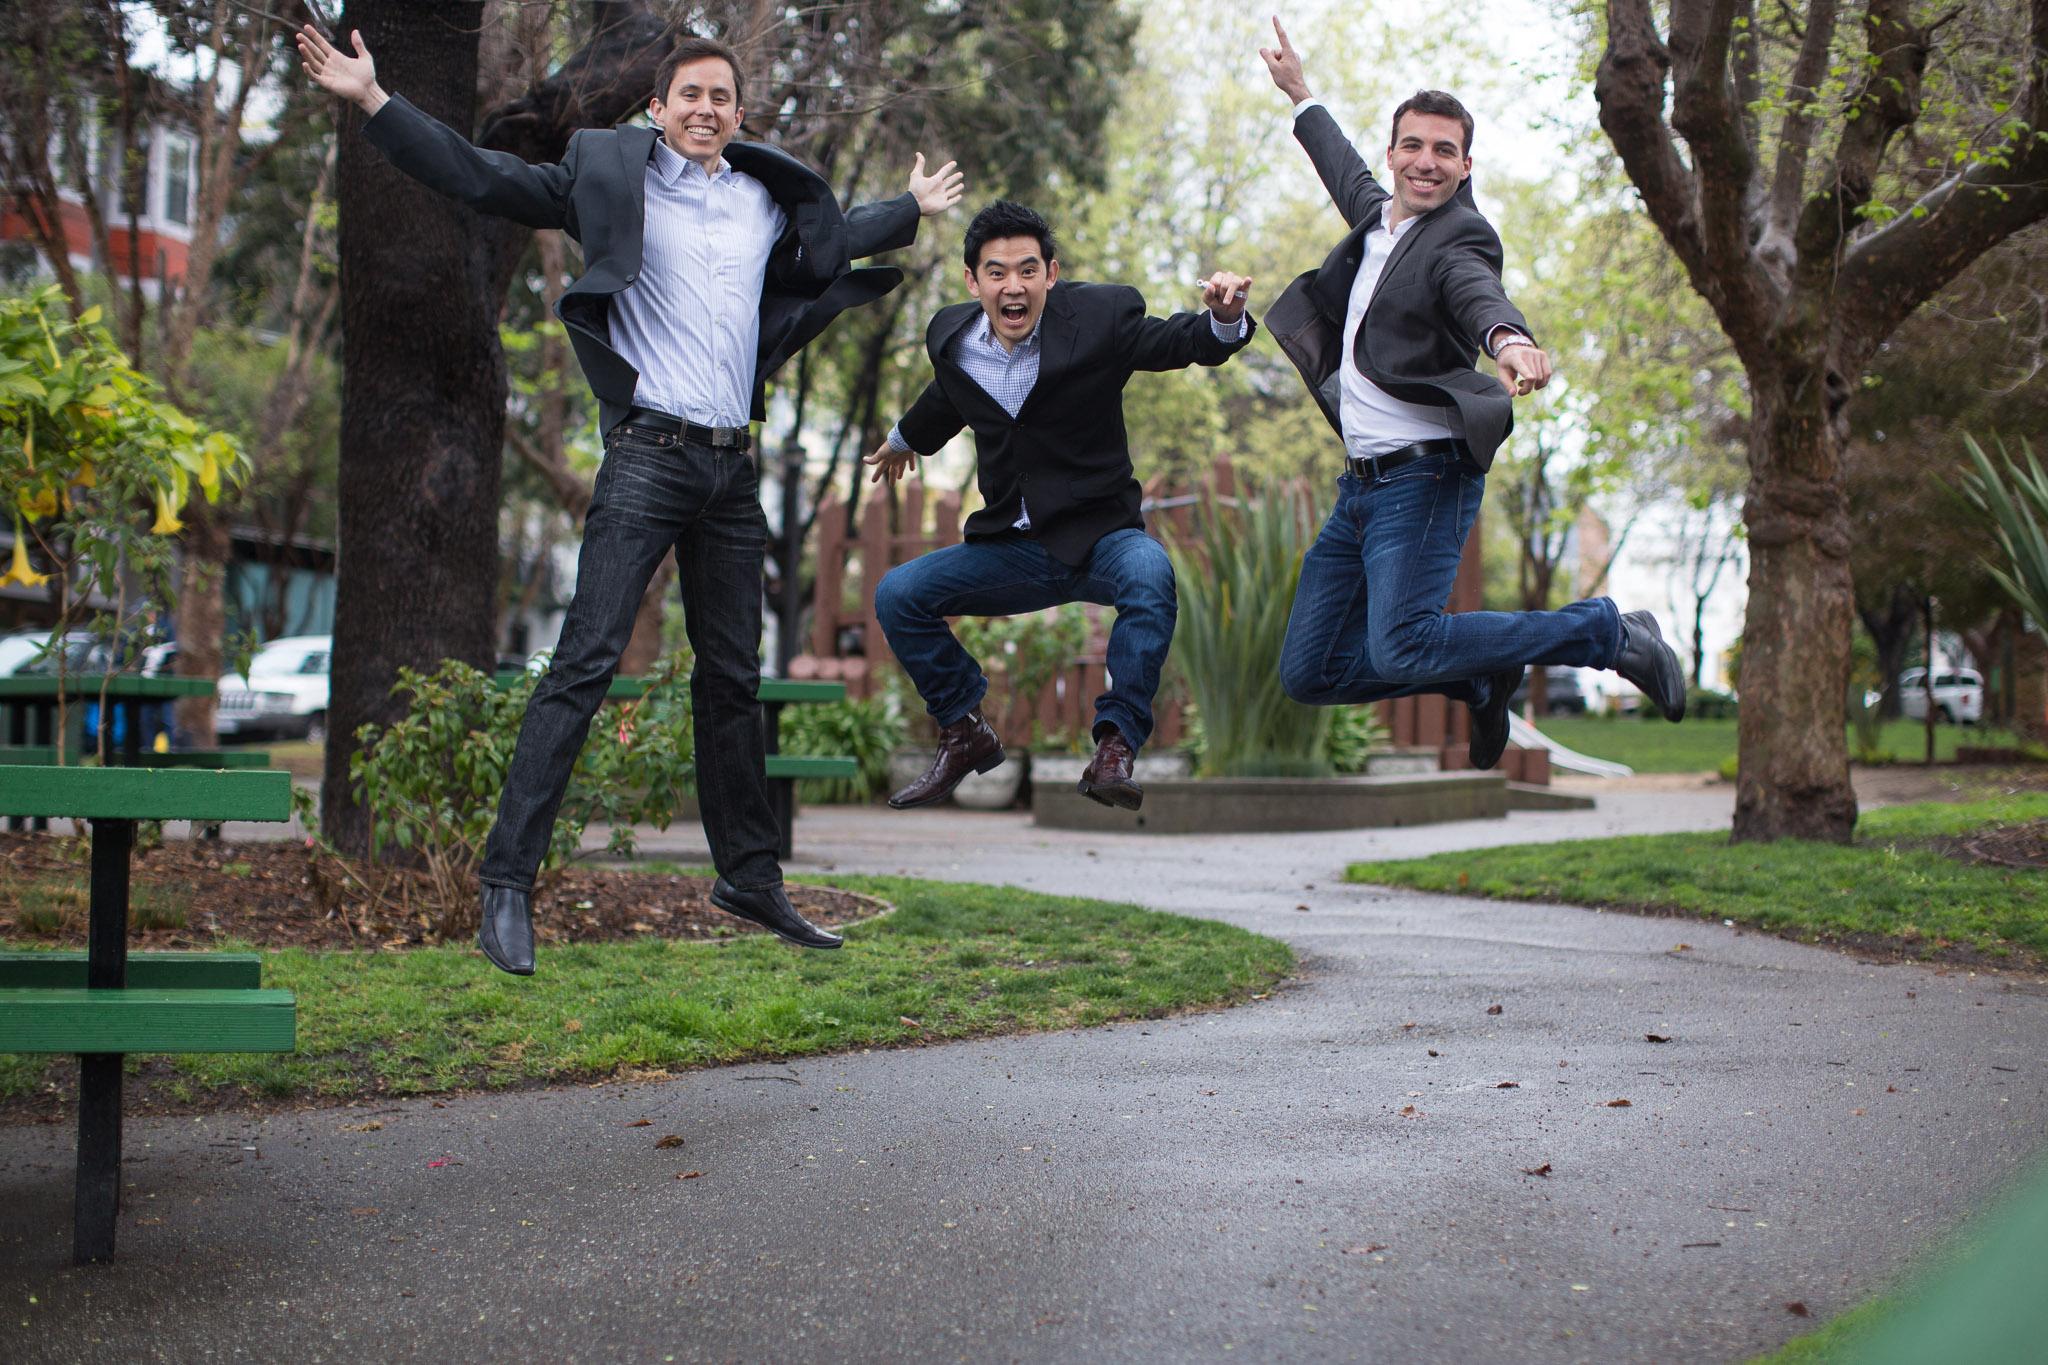 ZenPayroll founders (l to r) Joshua Reeves, Edward Kim, Tomer London,